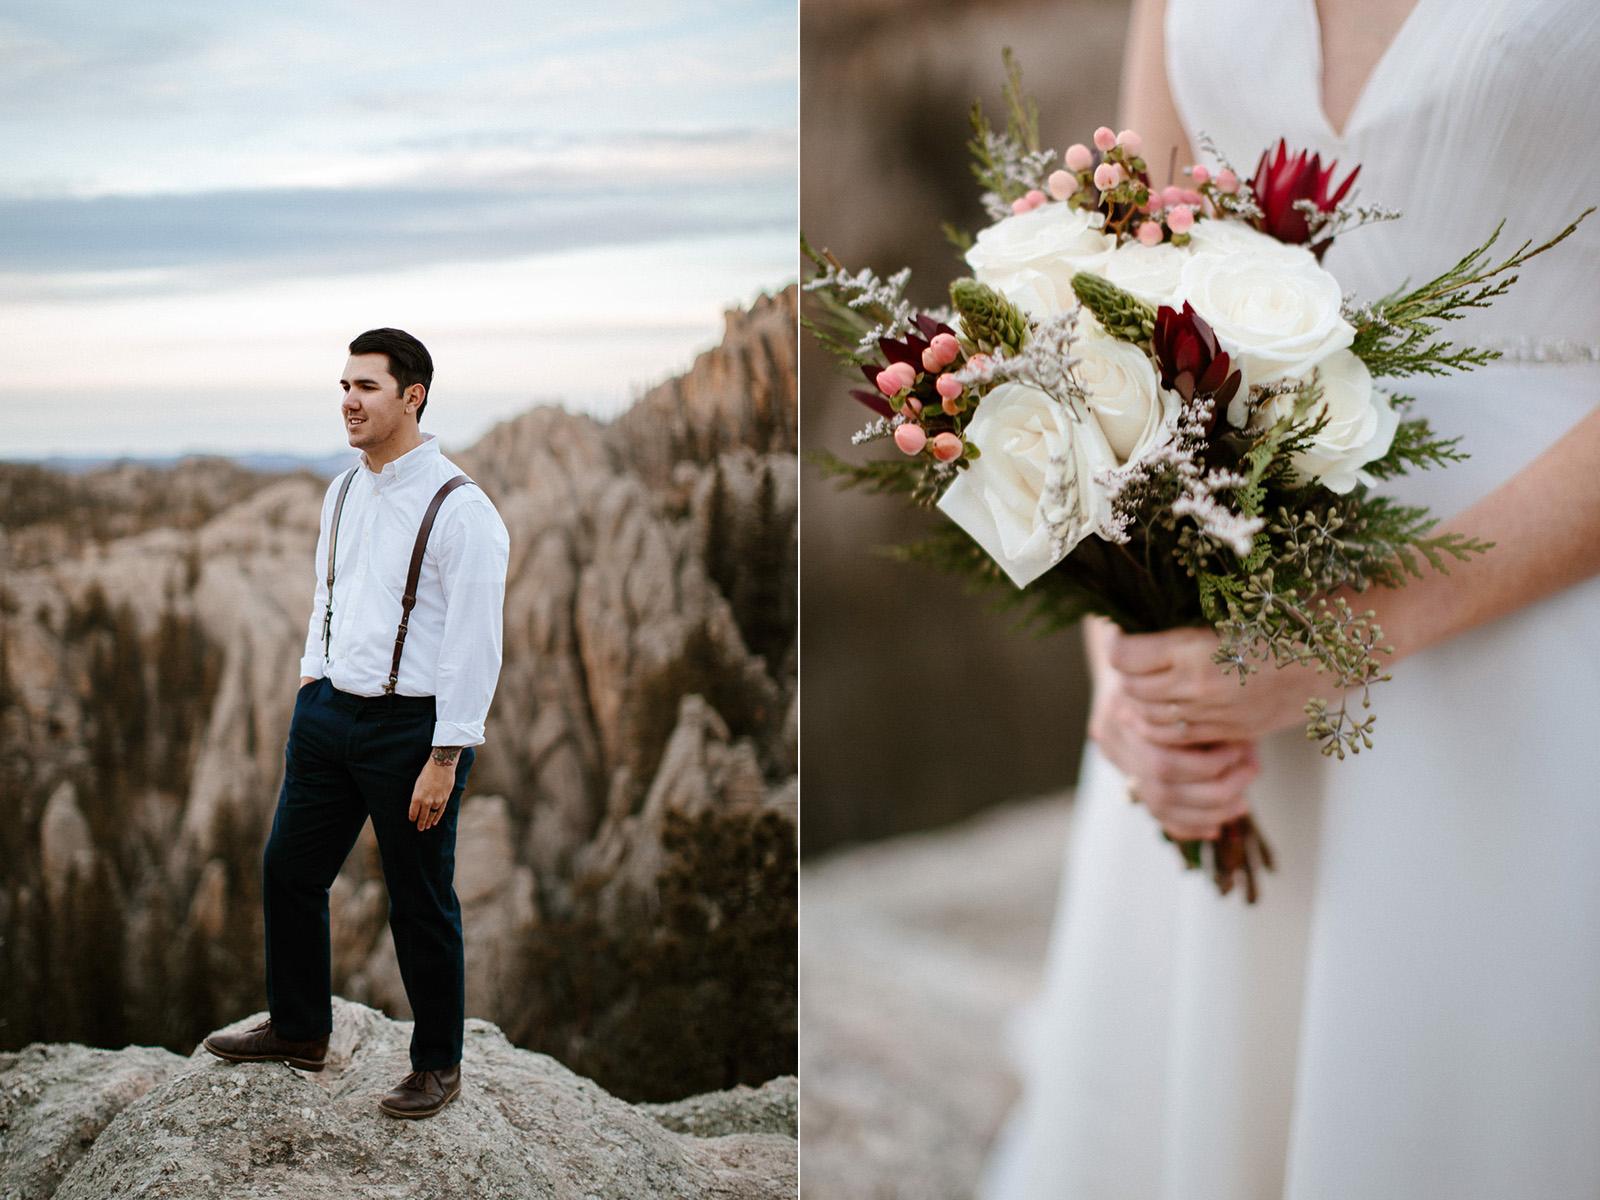 sioux-falls-black-hills-rapid-city-elopement-wedding-adventure-photographer-custer-sylvan-lake-56.jpg